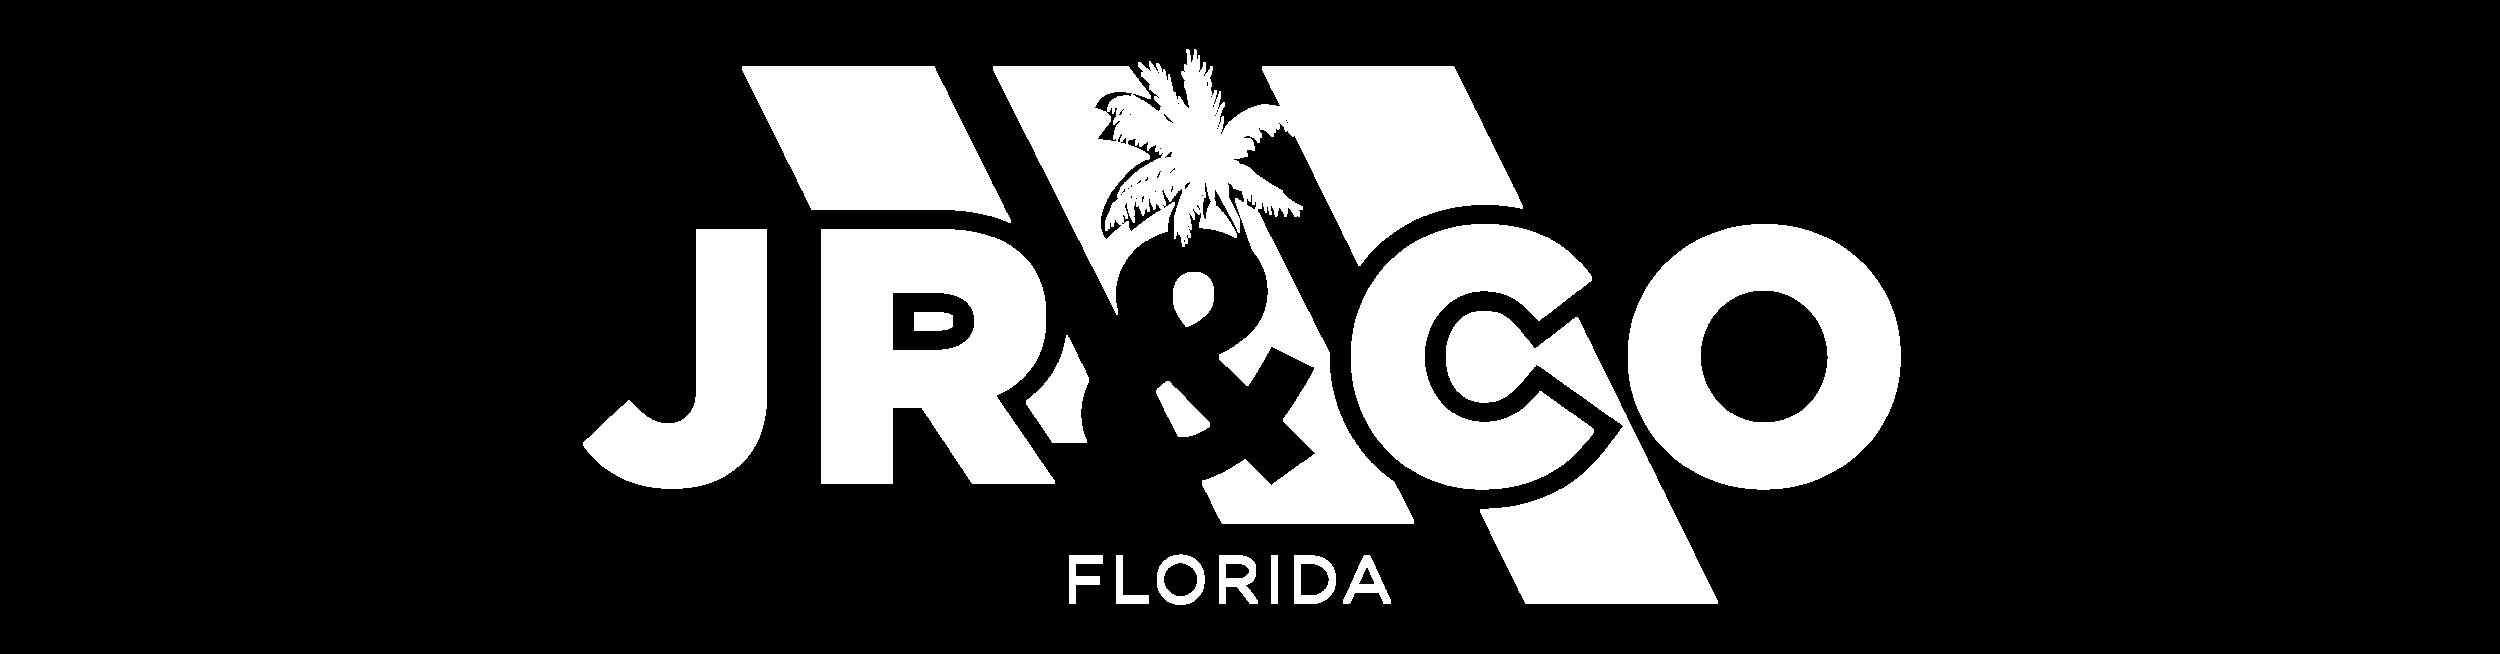 JRCO-header-logos-FL.png